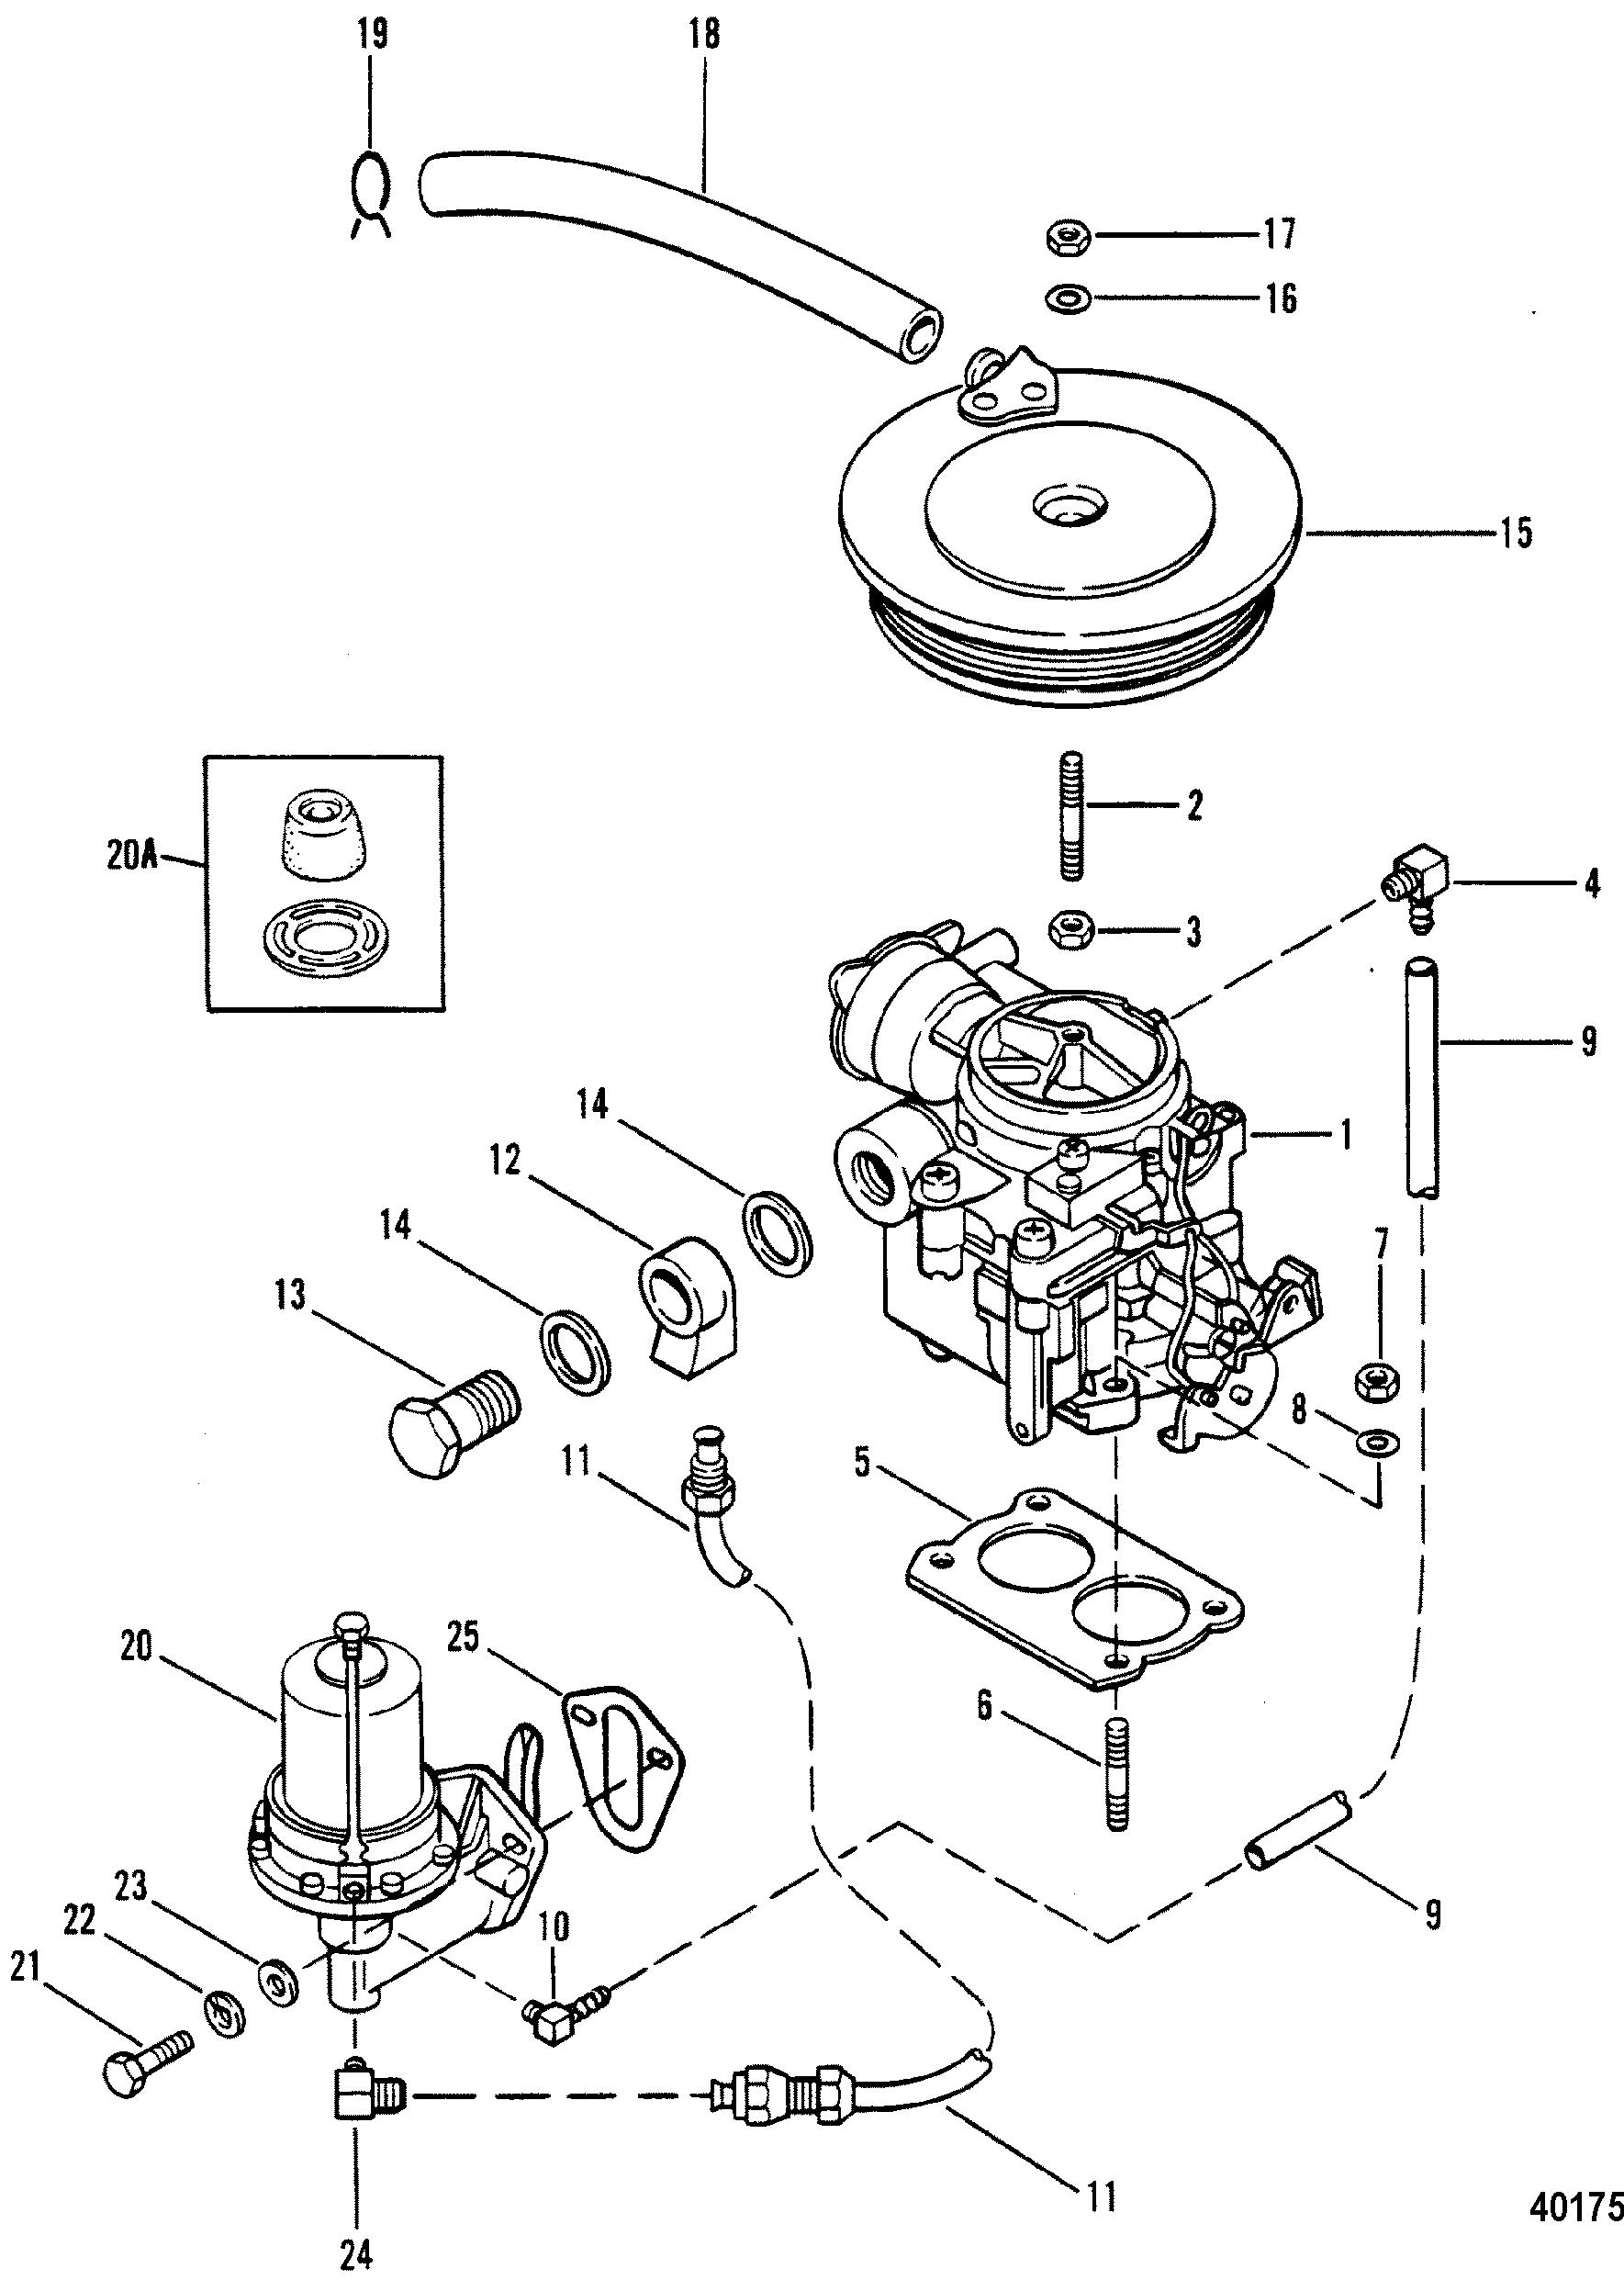 Mercruiser 470 Alternator Conversion Wiring Diagram : Carburetor and fuel pump for mercruiser engine